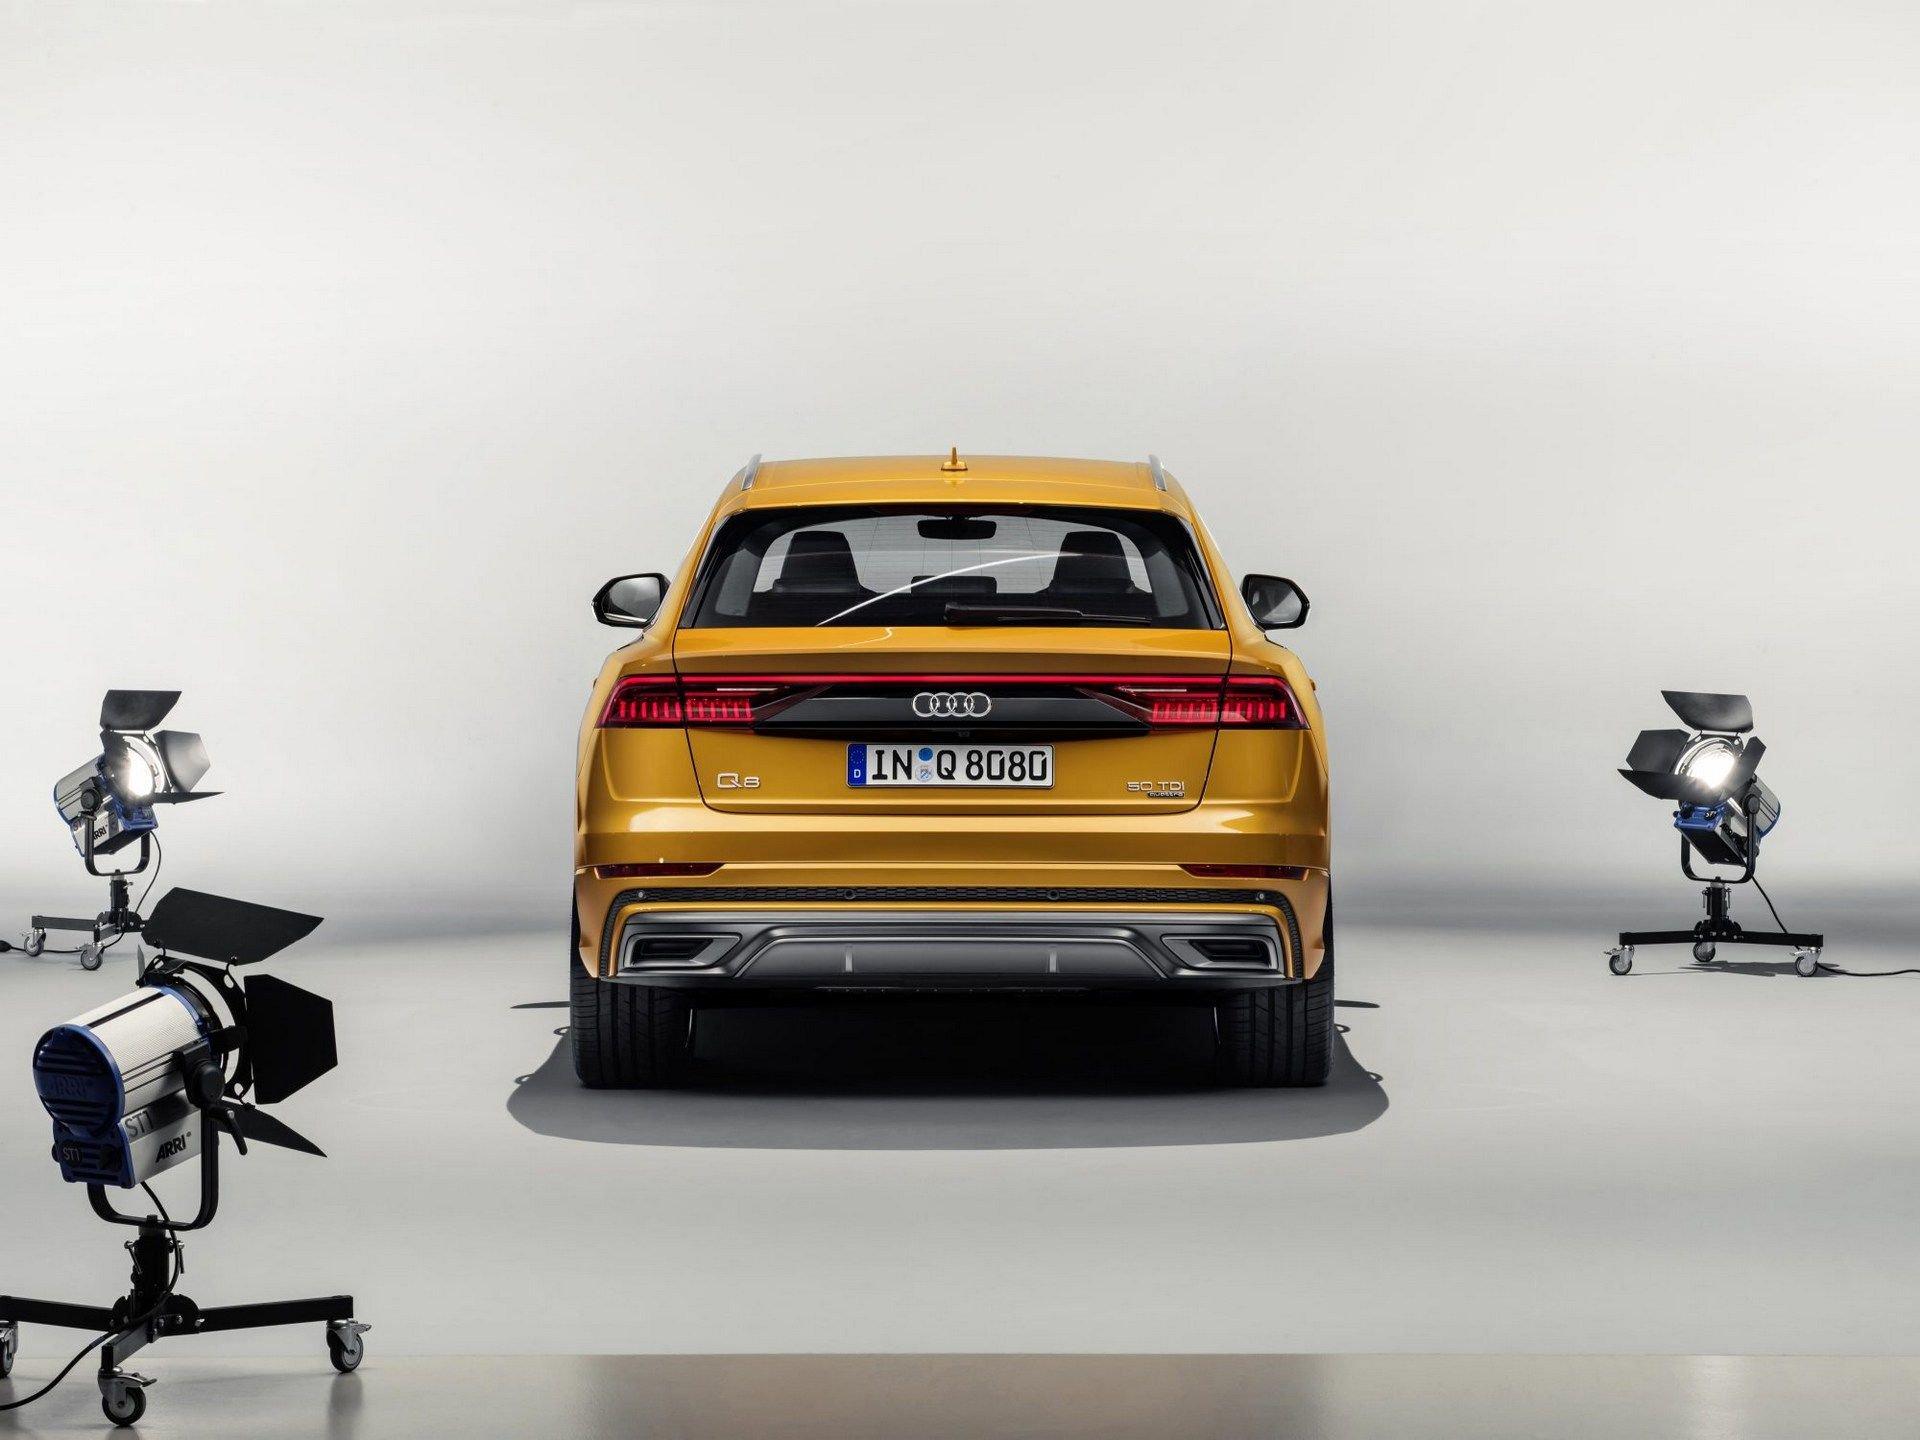 Audi Q8 2018 First Photos (11)